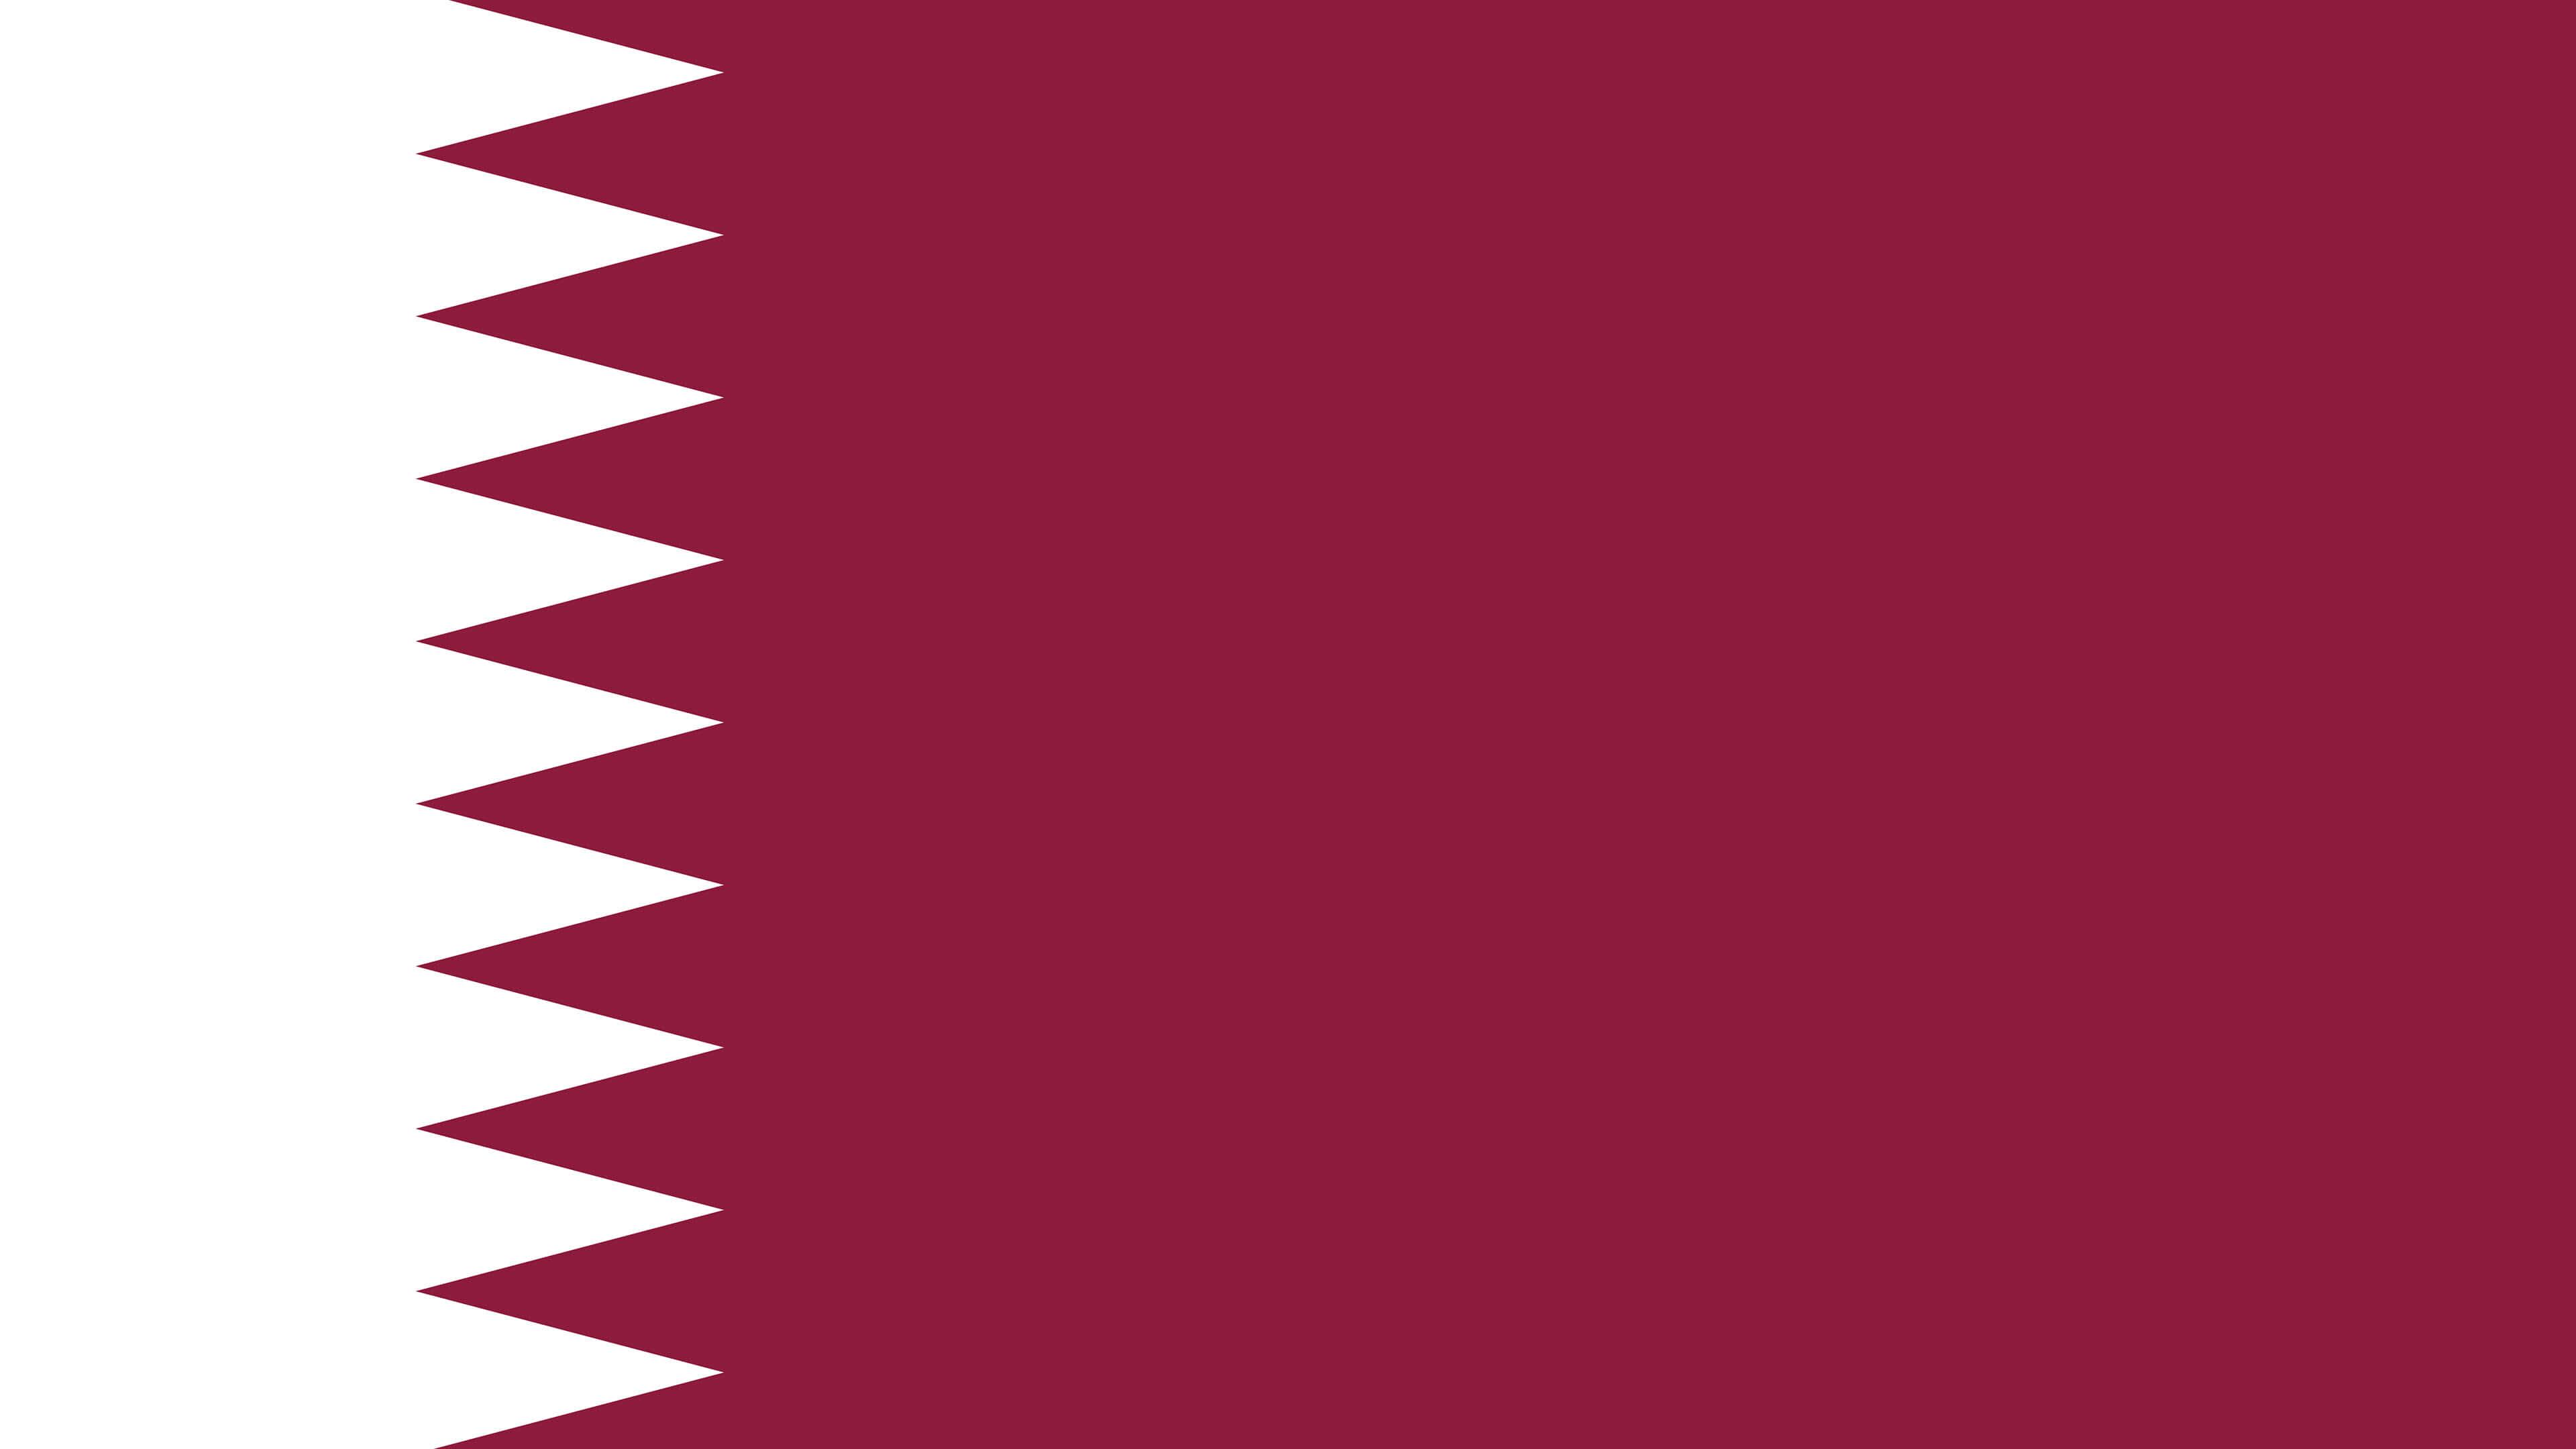 qatar flag uhd 4k wallpaper